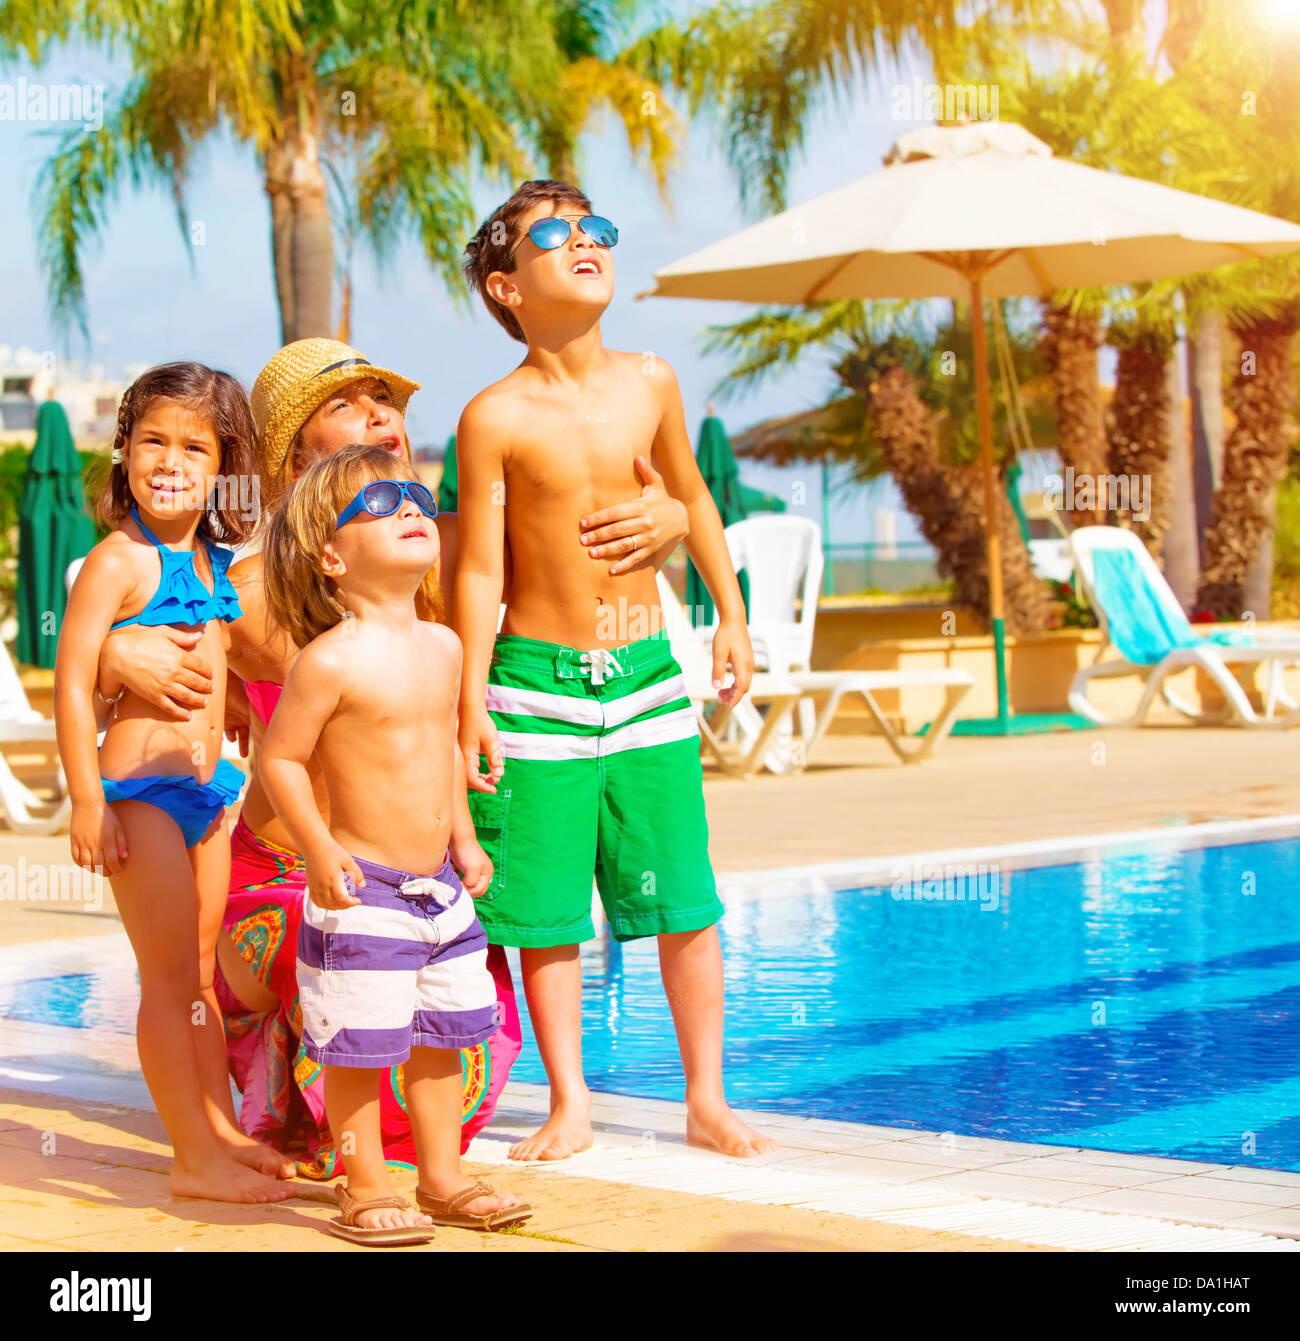 Cute happy family having fun near pool on luxury tropical resort Stock Photo Royalty Free Image